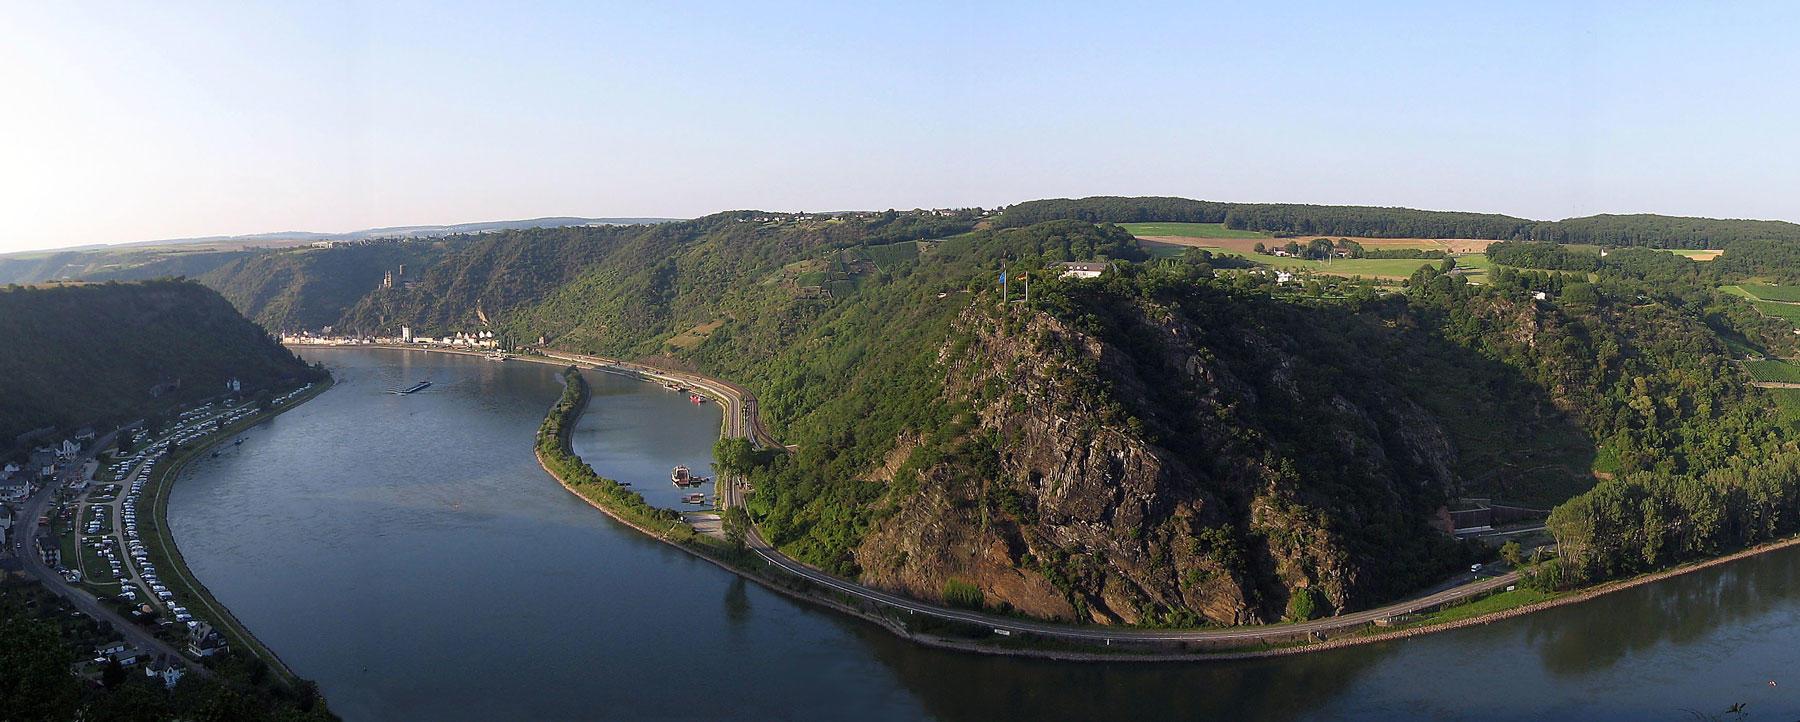 The Rhine in Germany